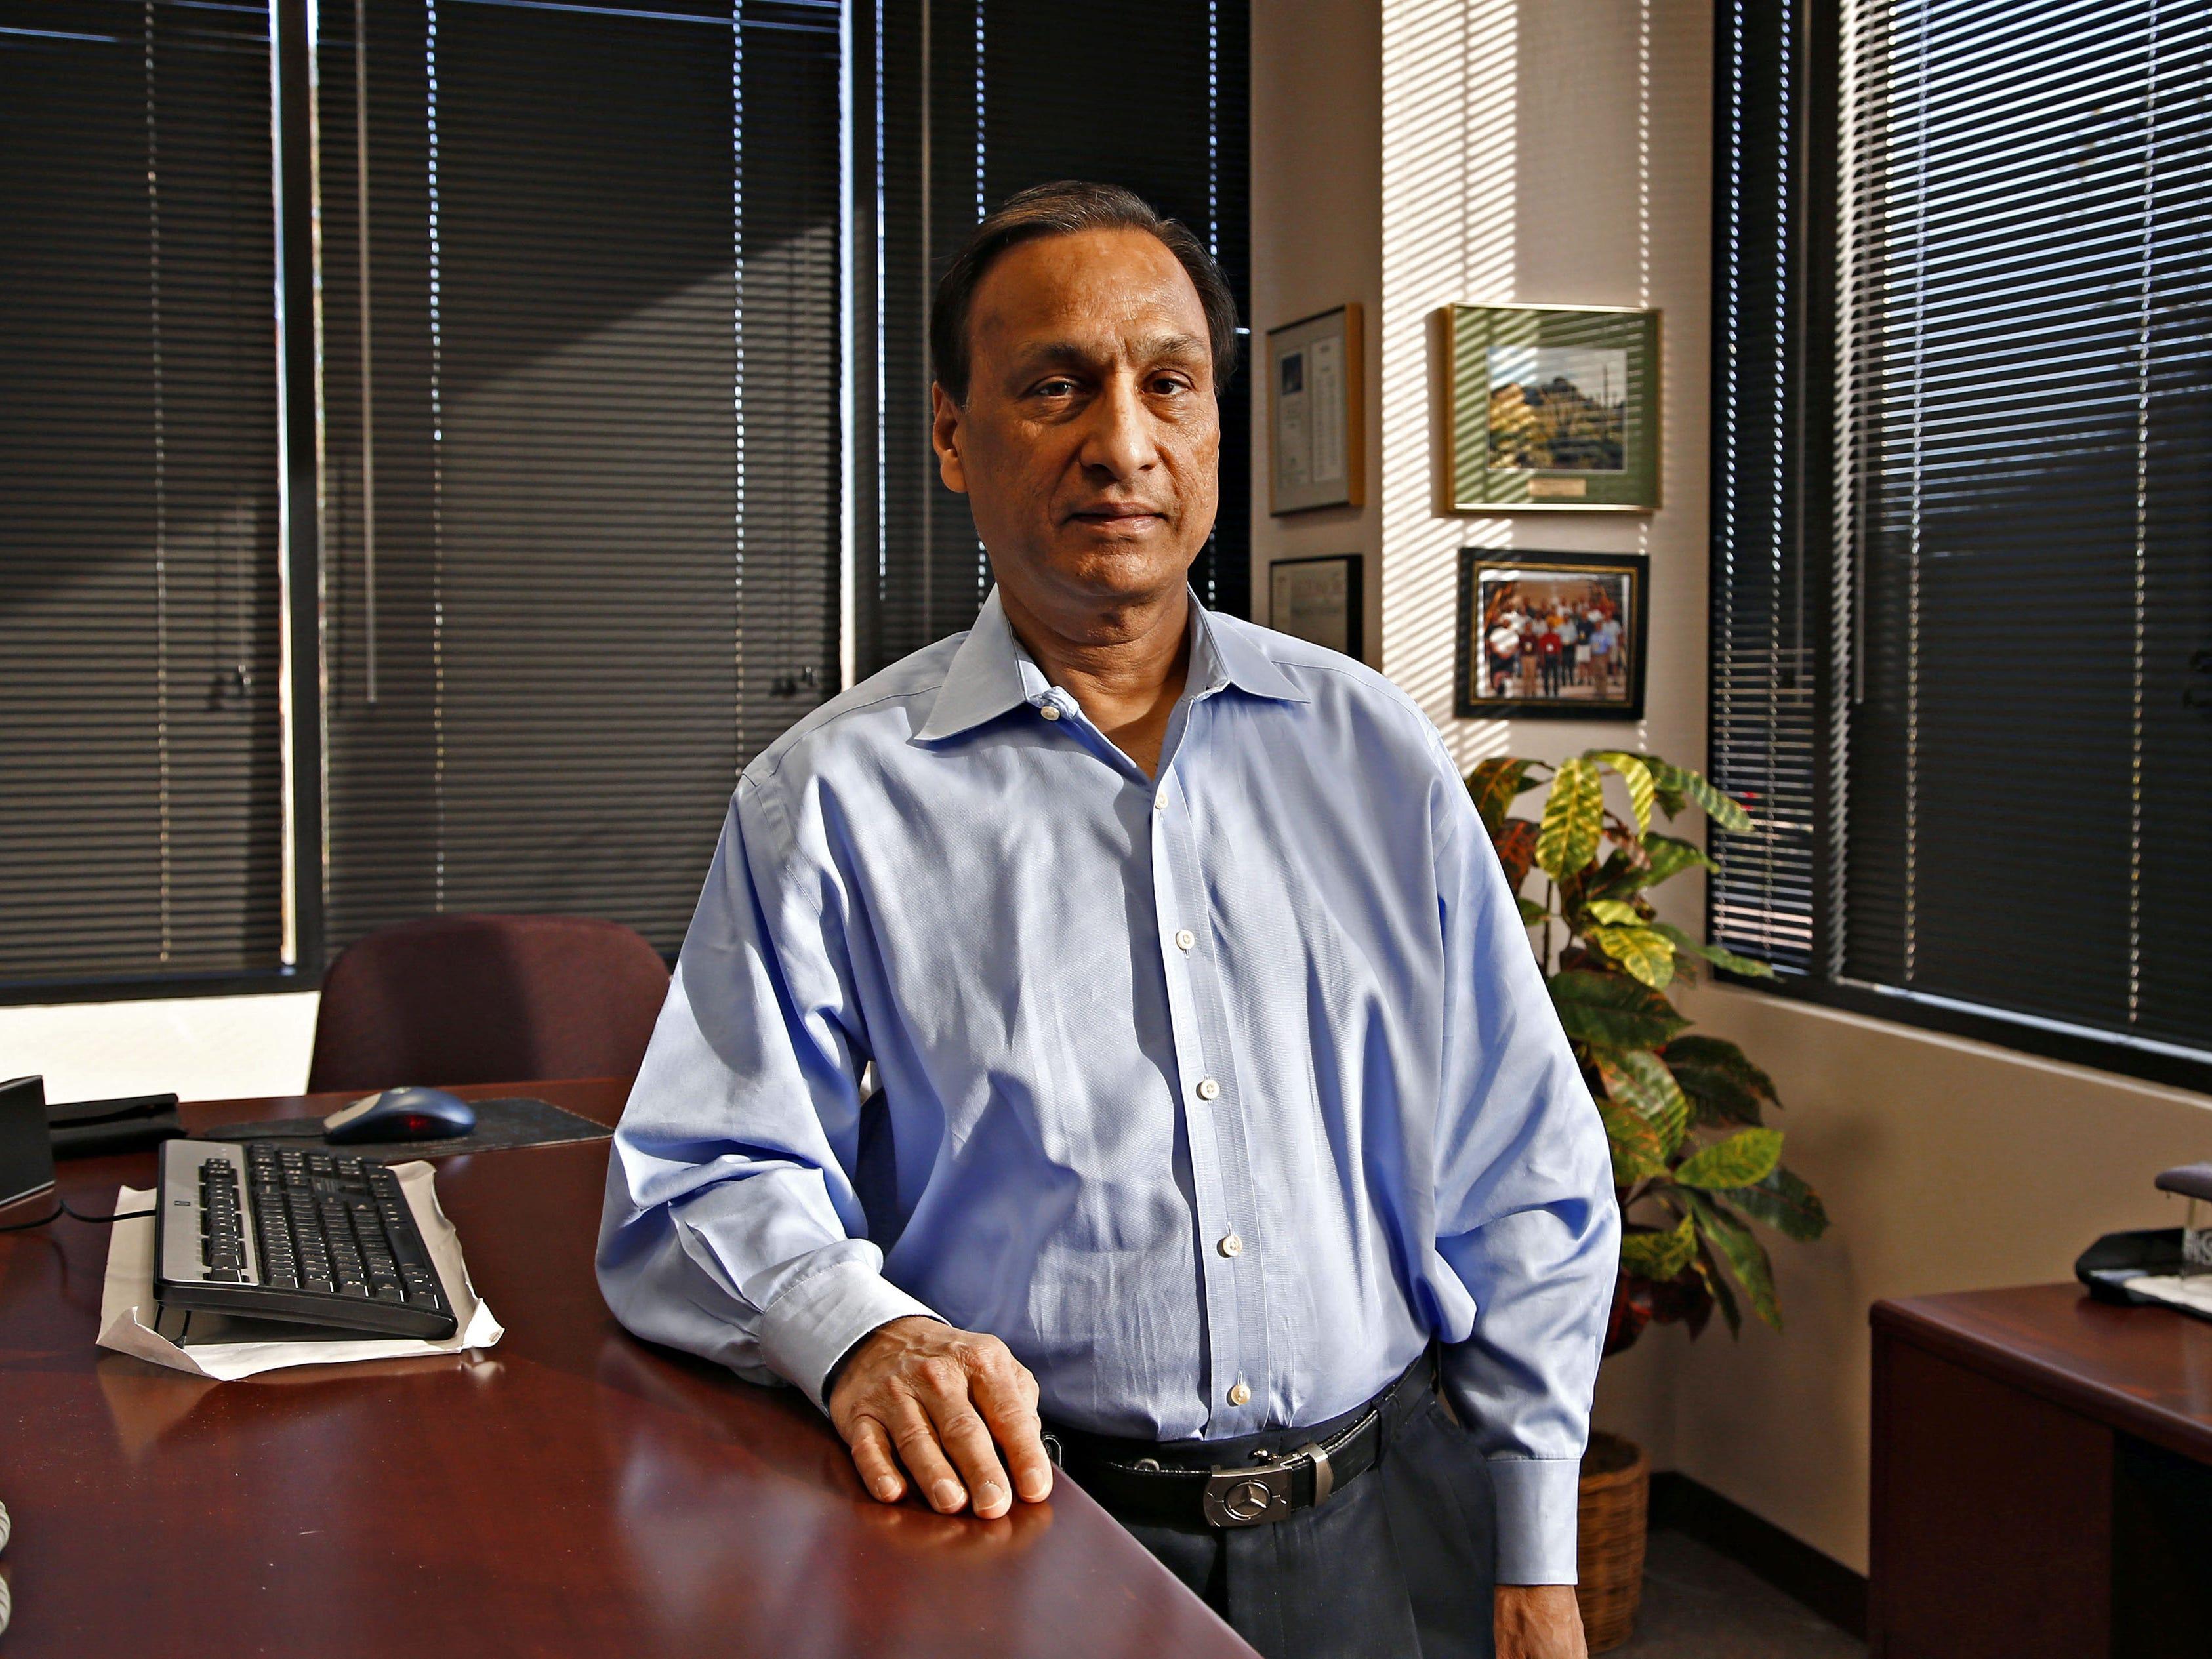 Microchip Technology Inc.'s Steve Sanghi: Summary compensation: $7,893,460. Adjusted compensation: $13,739,262. TTM profit: $255 million. TTM revenue: $4 billion. 2017 stock: 39.3 percent. Capitalization: $22.1 billion.